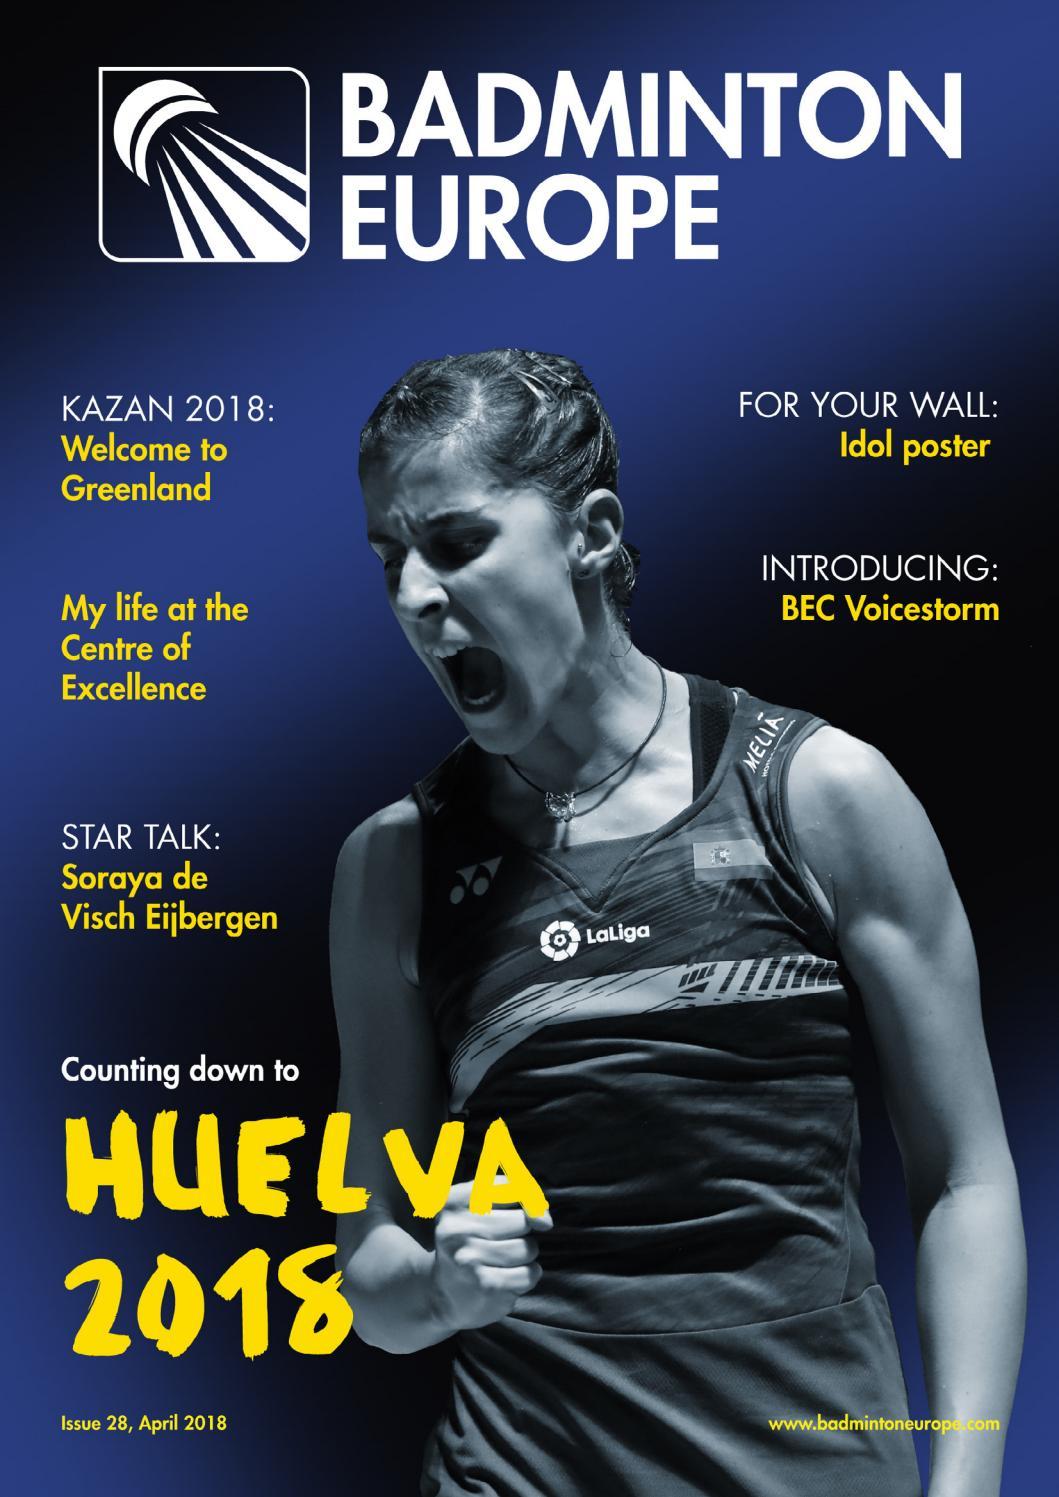 Badminton Europe Magazine issue 27   April 2018 by Badminton Europe - issuu 9b933aae87